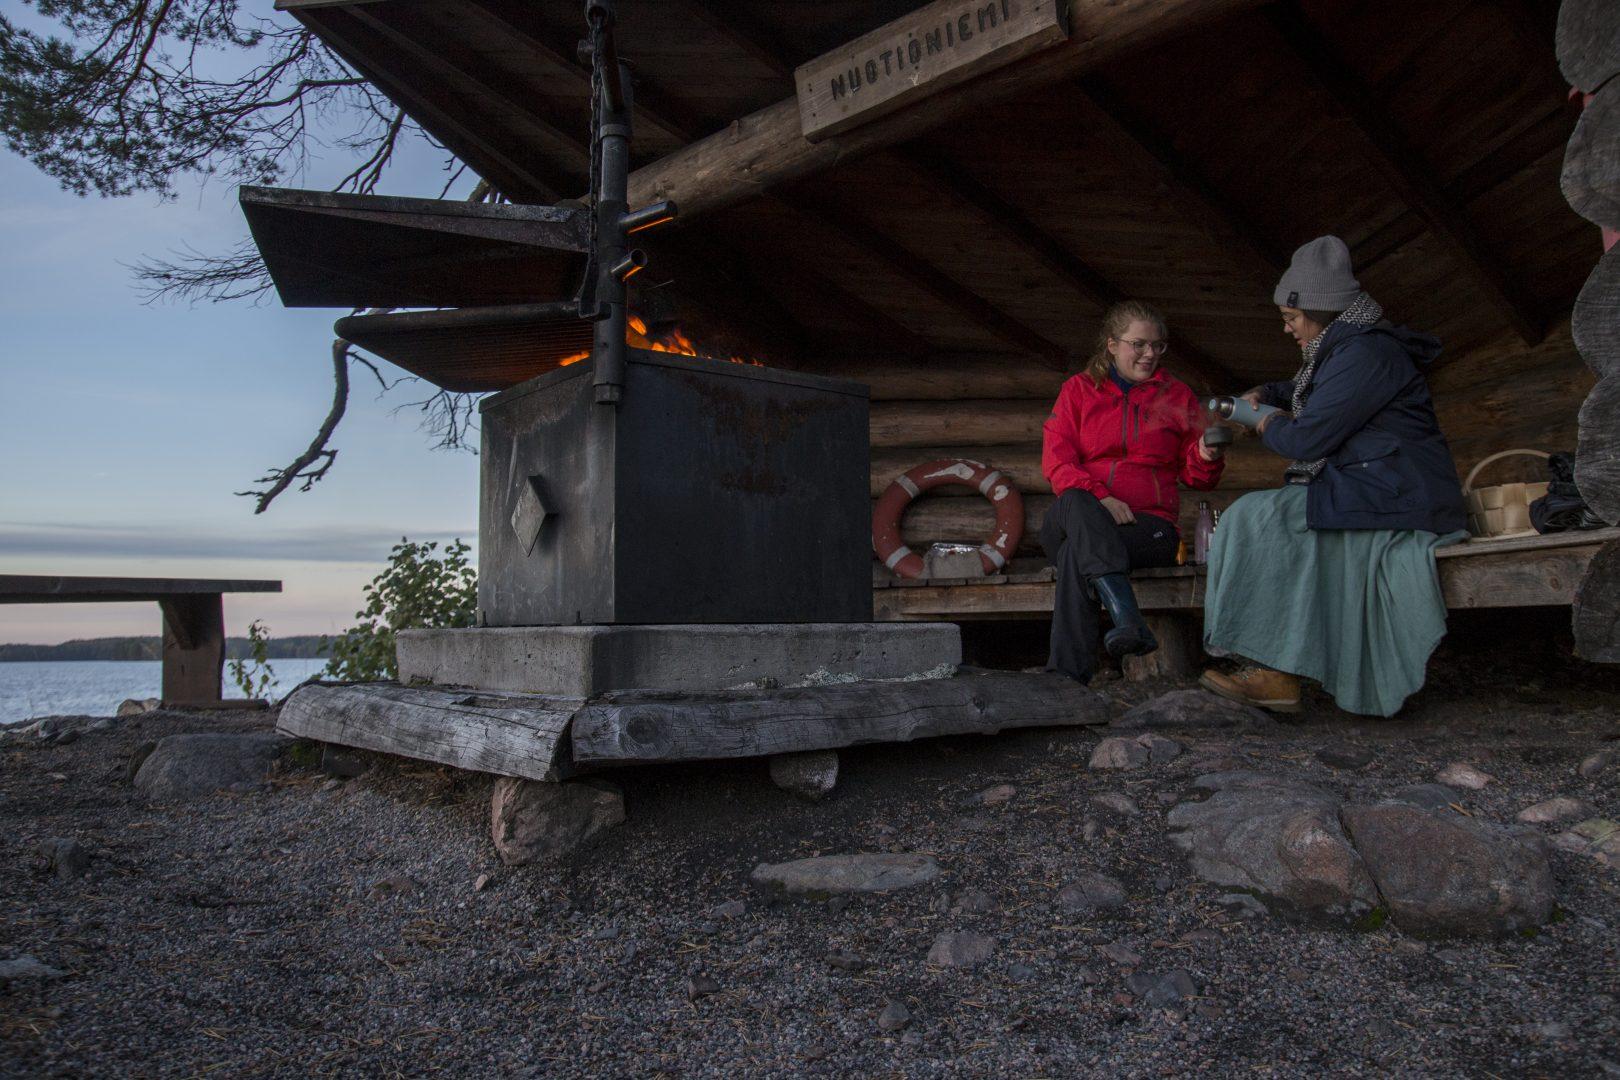 ©Lahiomutsi Mantyharju VR Junalla Ruska Matkailu Reissu Matka Kotimaanmatkailu-7747